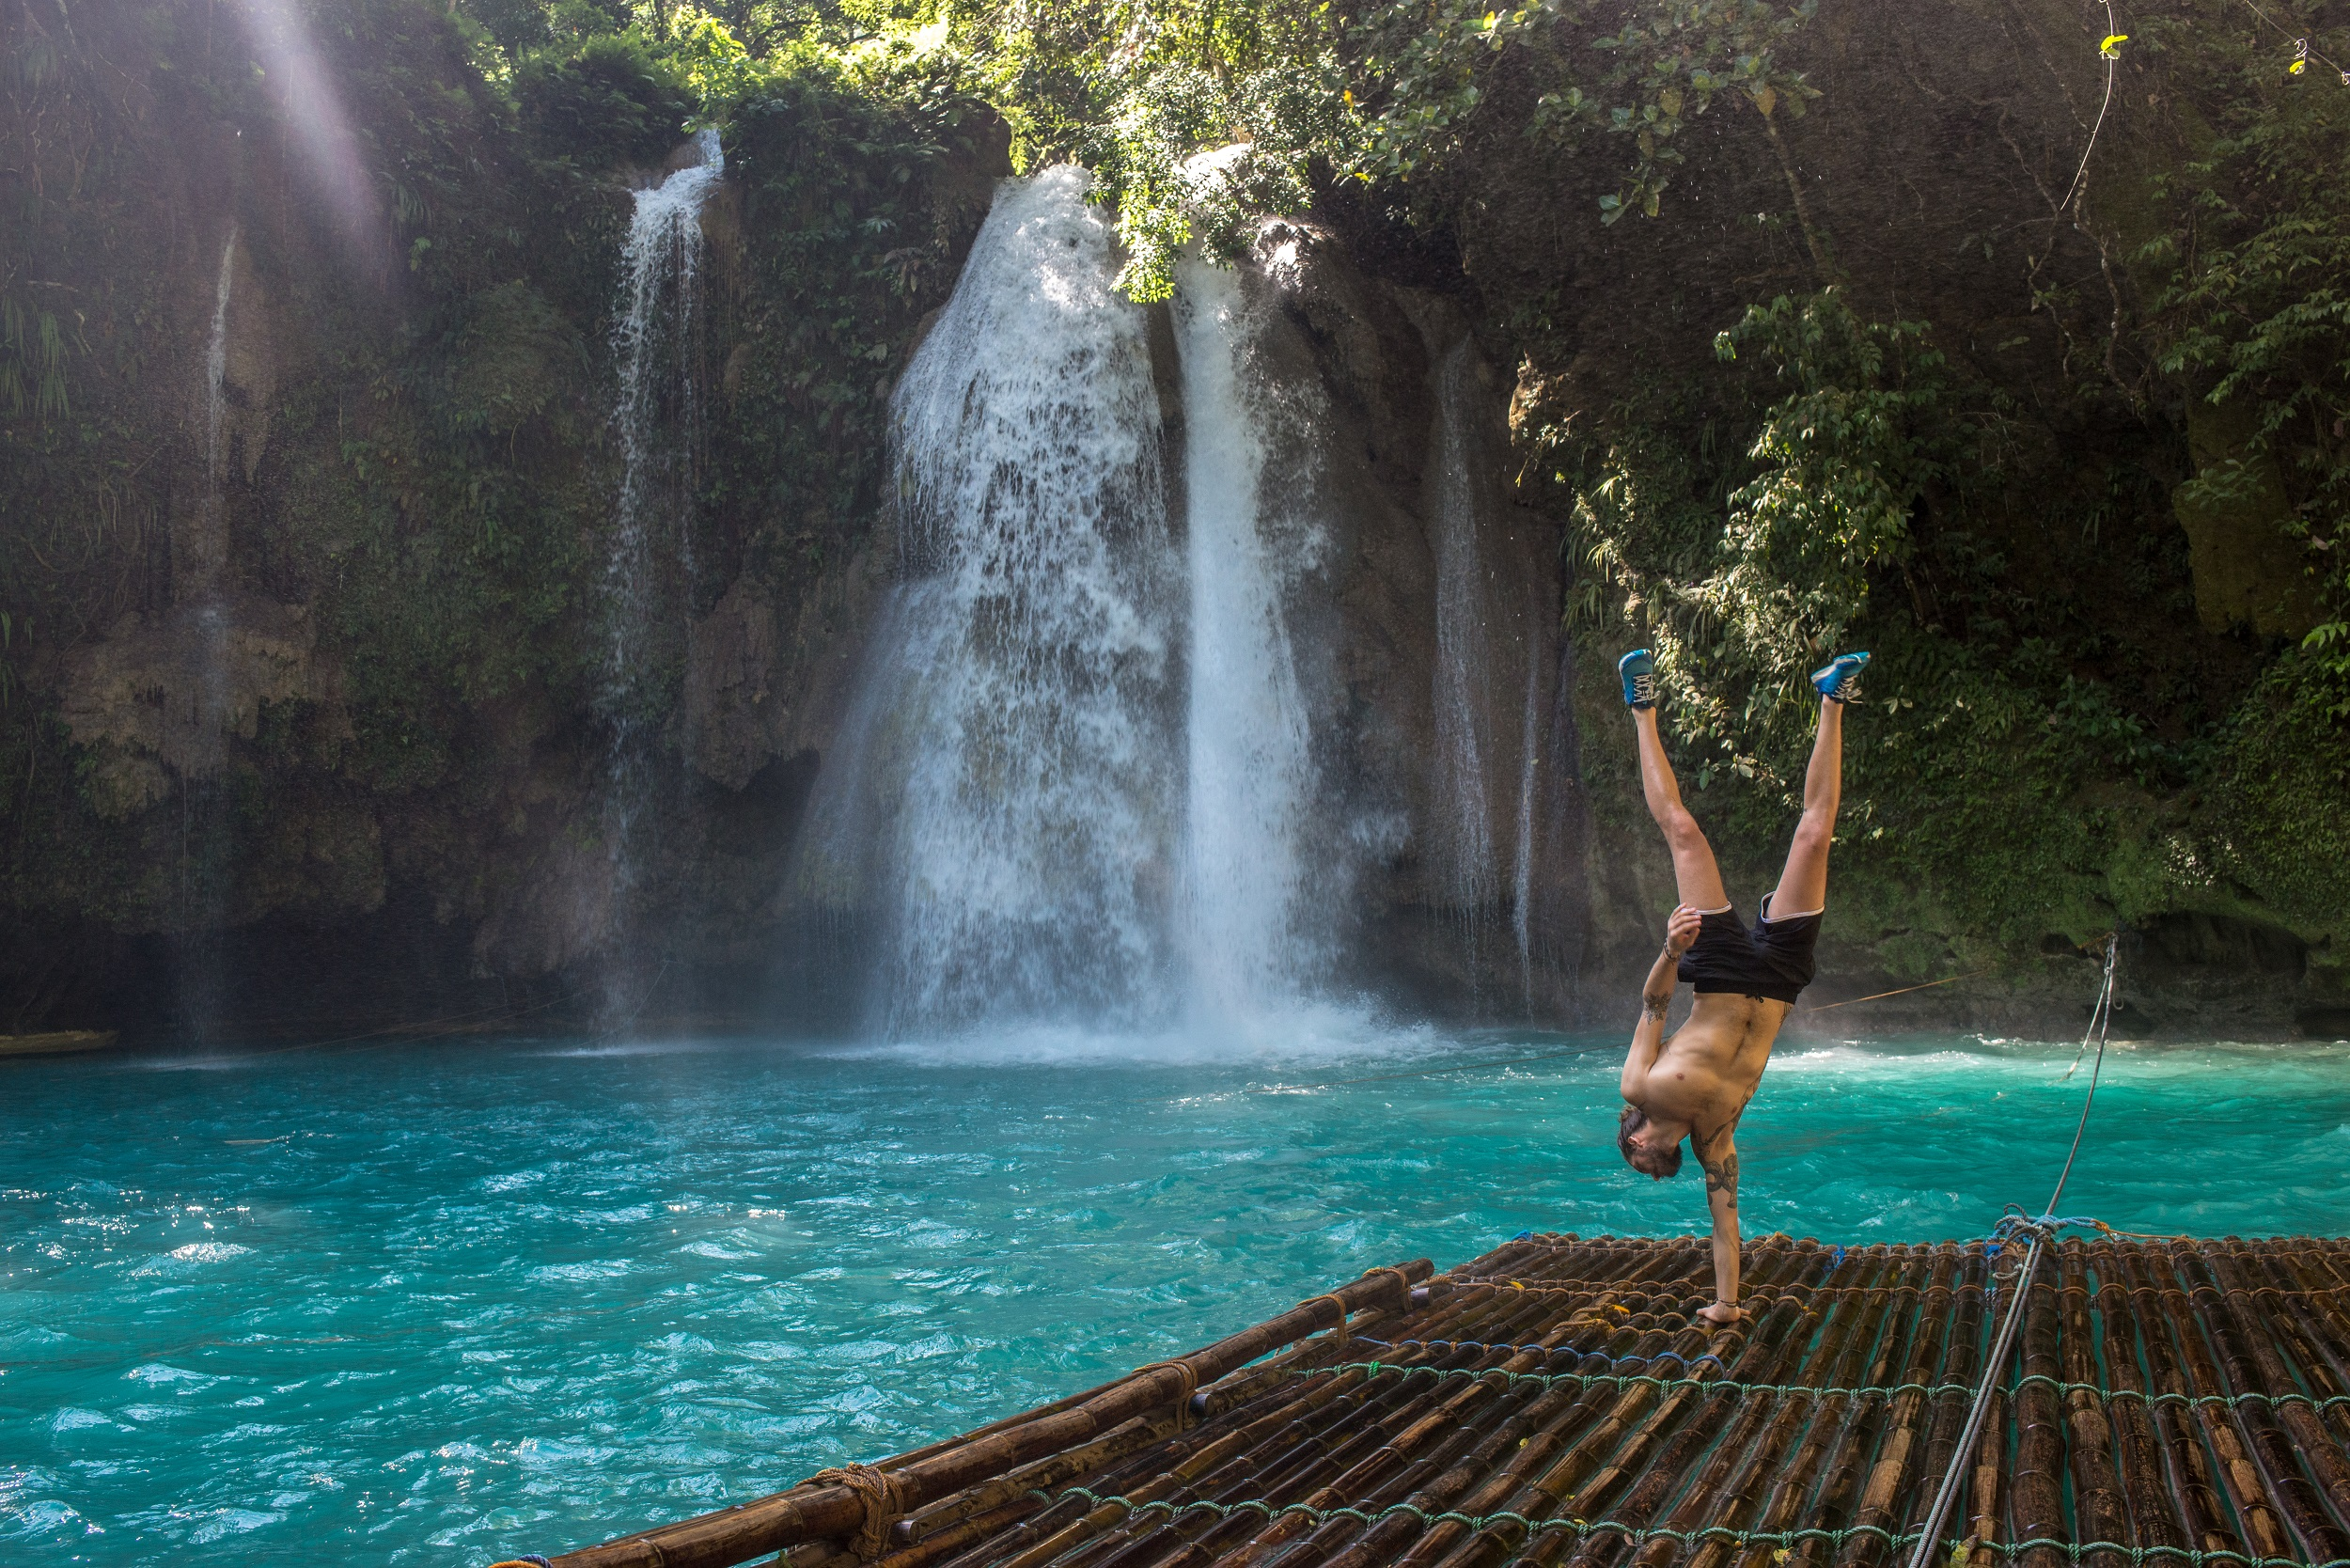 Kawasan Falls - Cebu Island - The Philippines - Banana Journey (2)